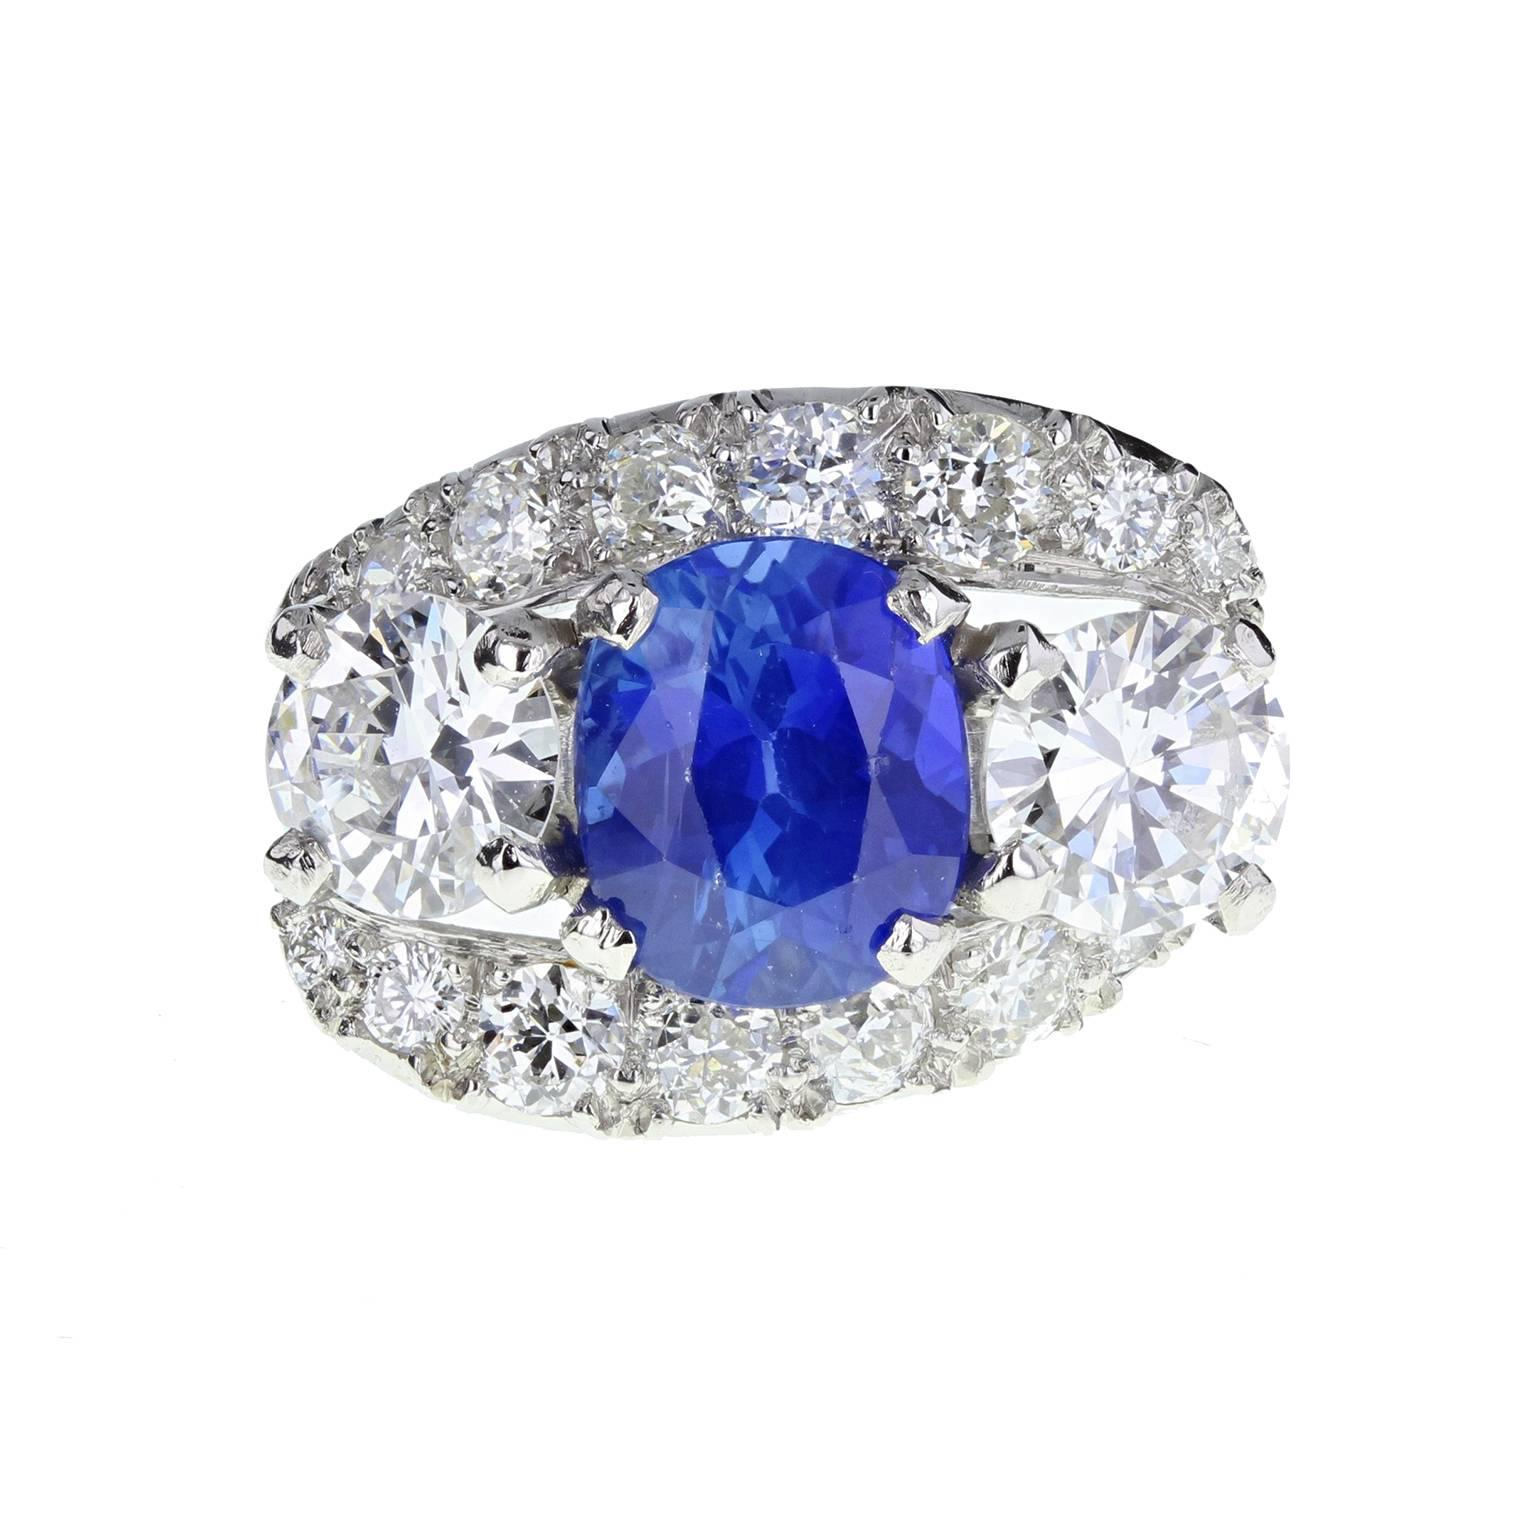 Exceptional Ceylon Sapphire Diamond Platinum Three Stone Ring